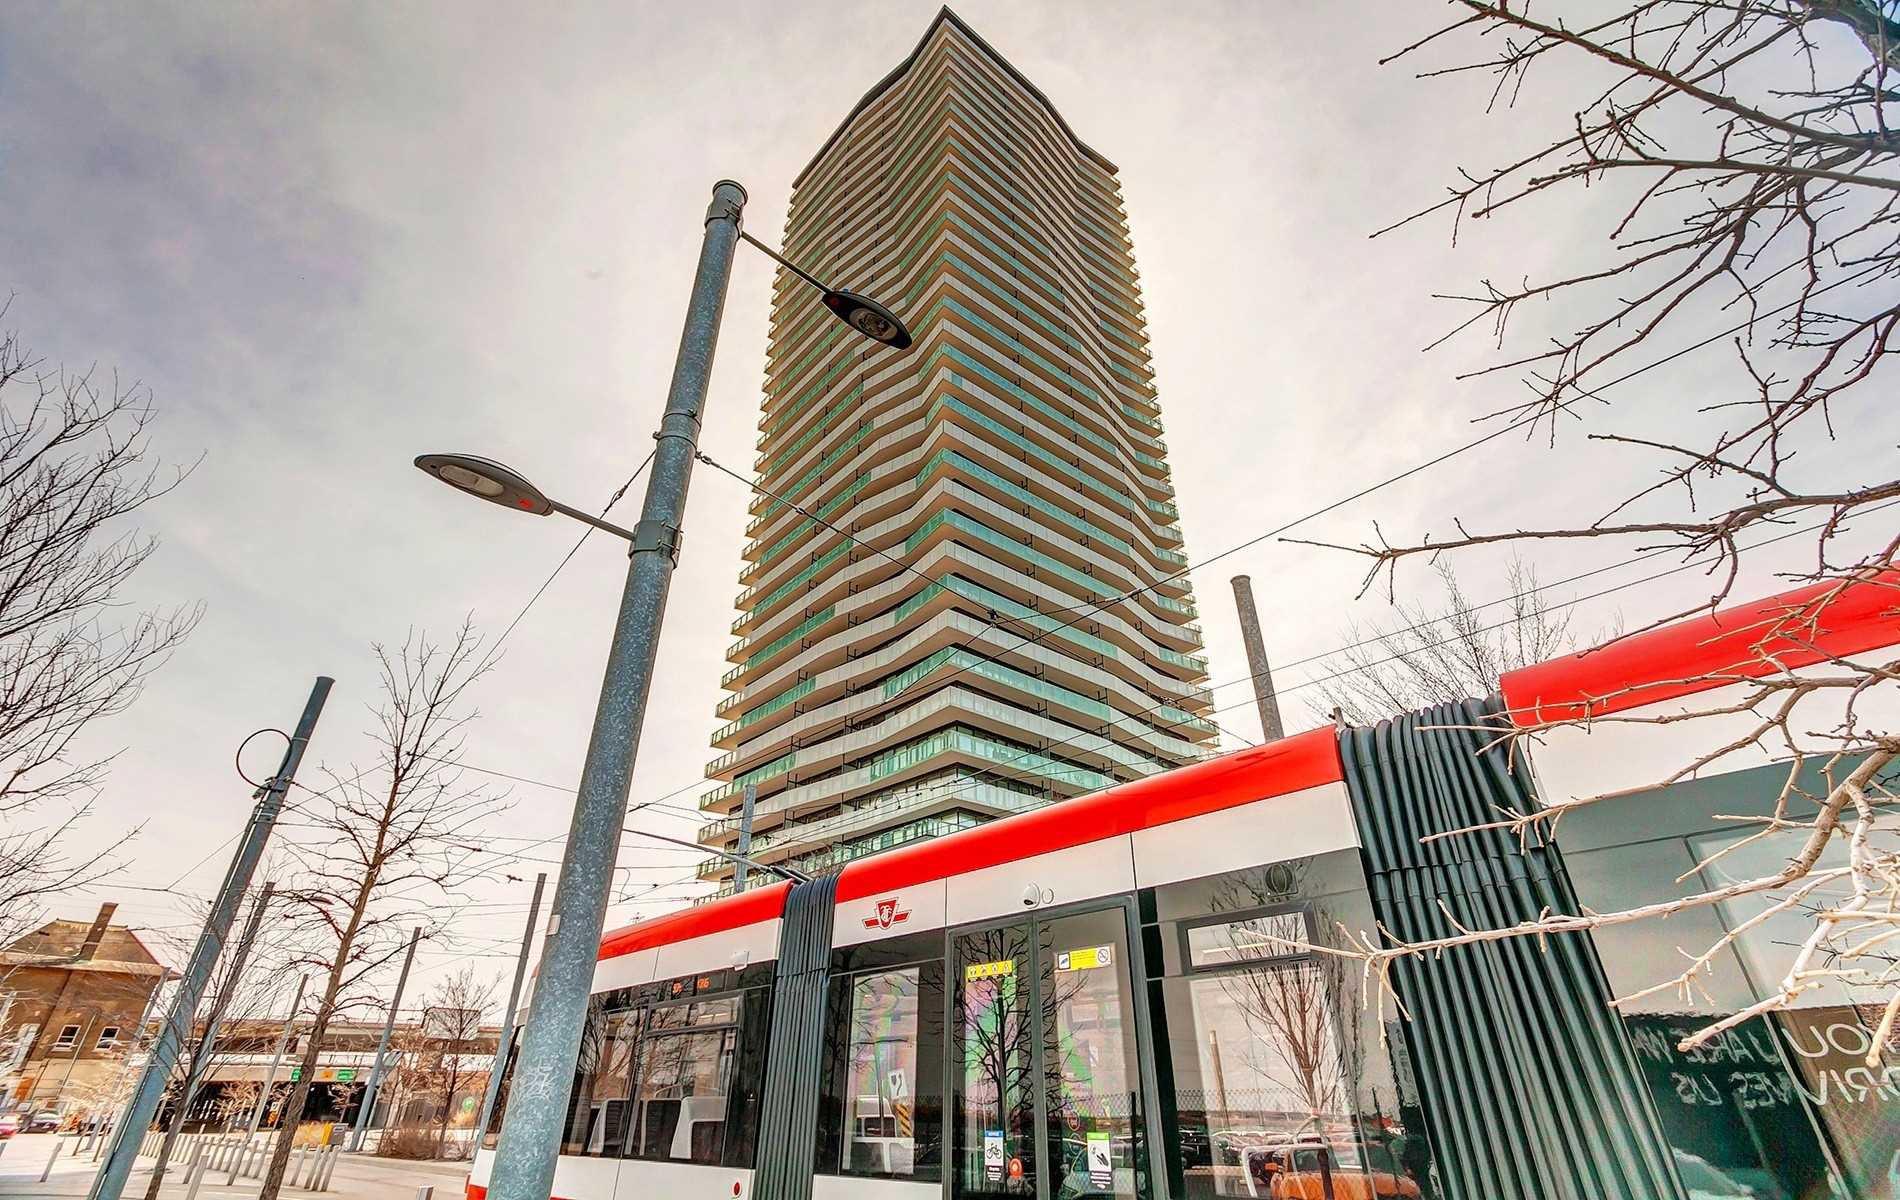 Main Photo: 3407 390 Cherry Street in Toronto: Waterfront Communities C8 Condo for lease (Toronto C08)  : MLS®# C4991702